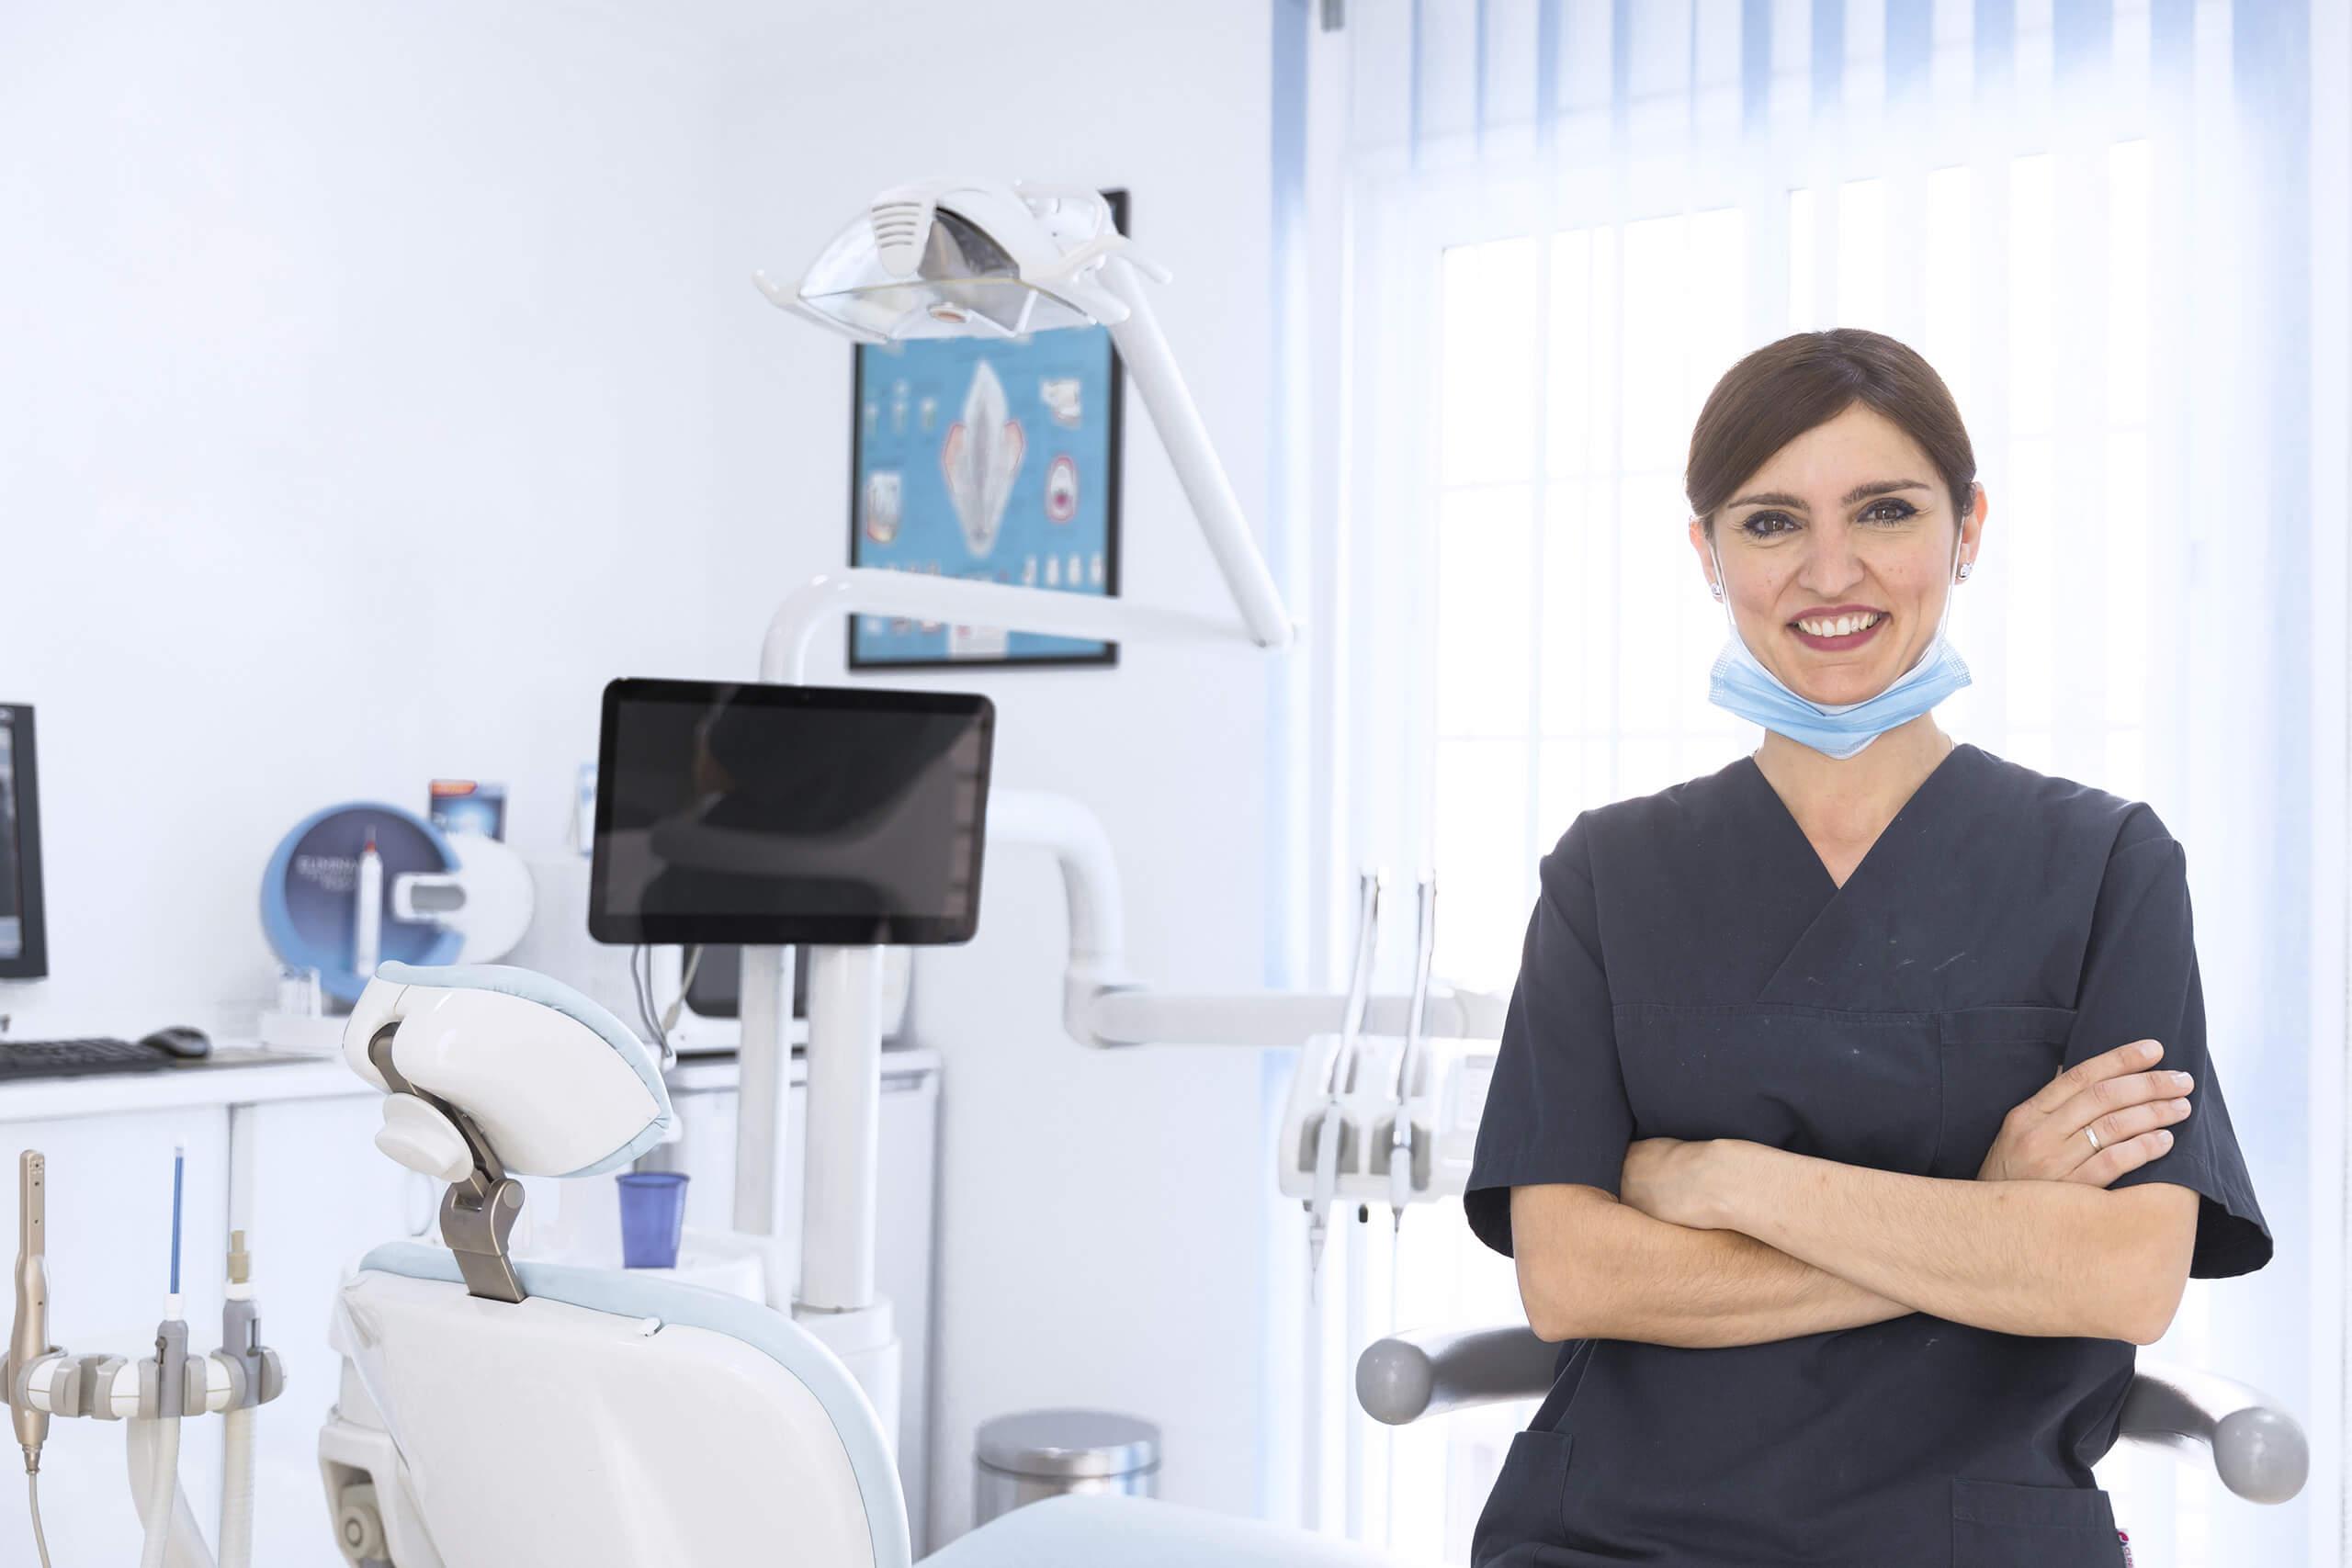 393677 PCF7 FP 302 Freepik Freepik | Dentalzentrum Lörrach